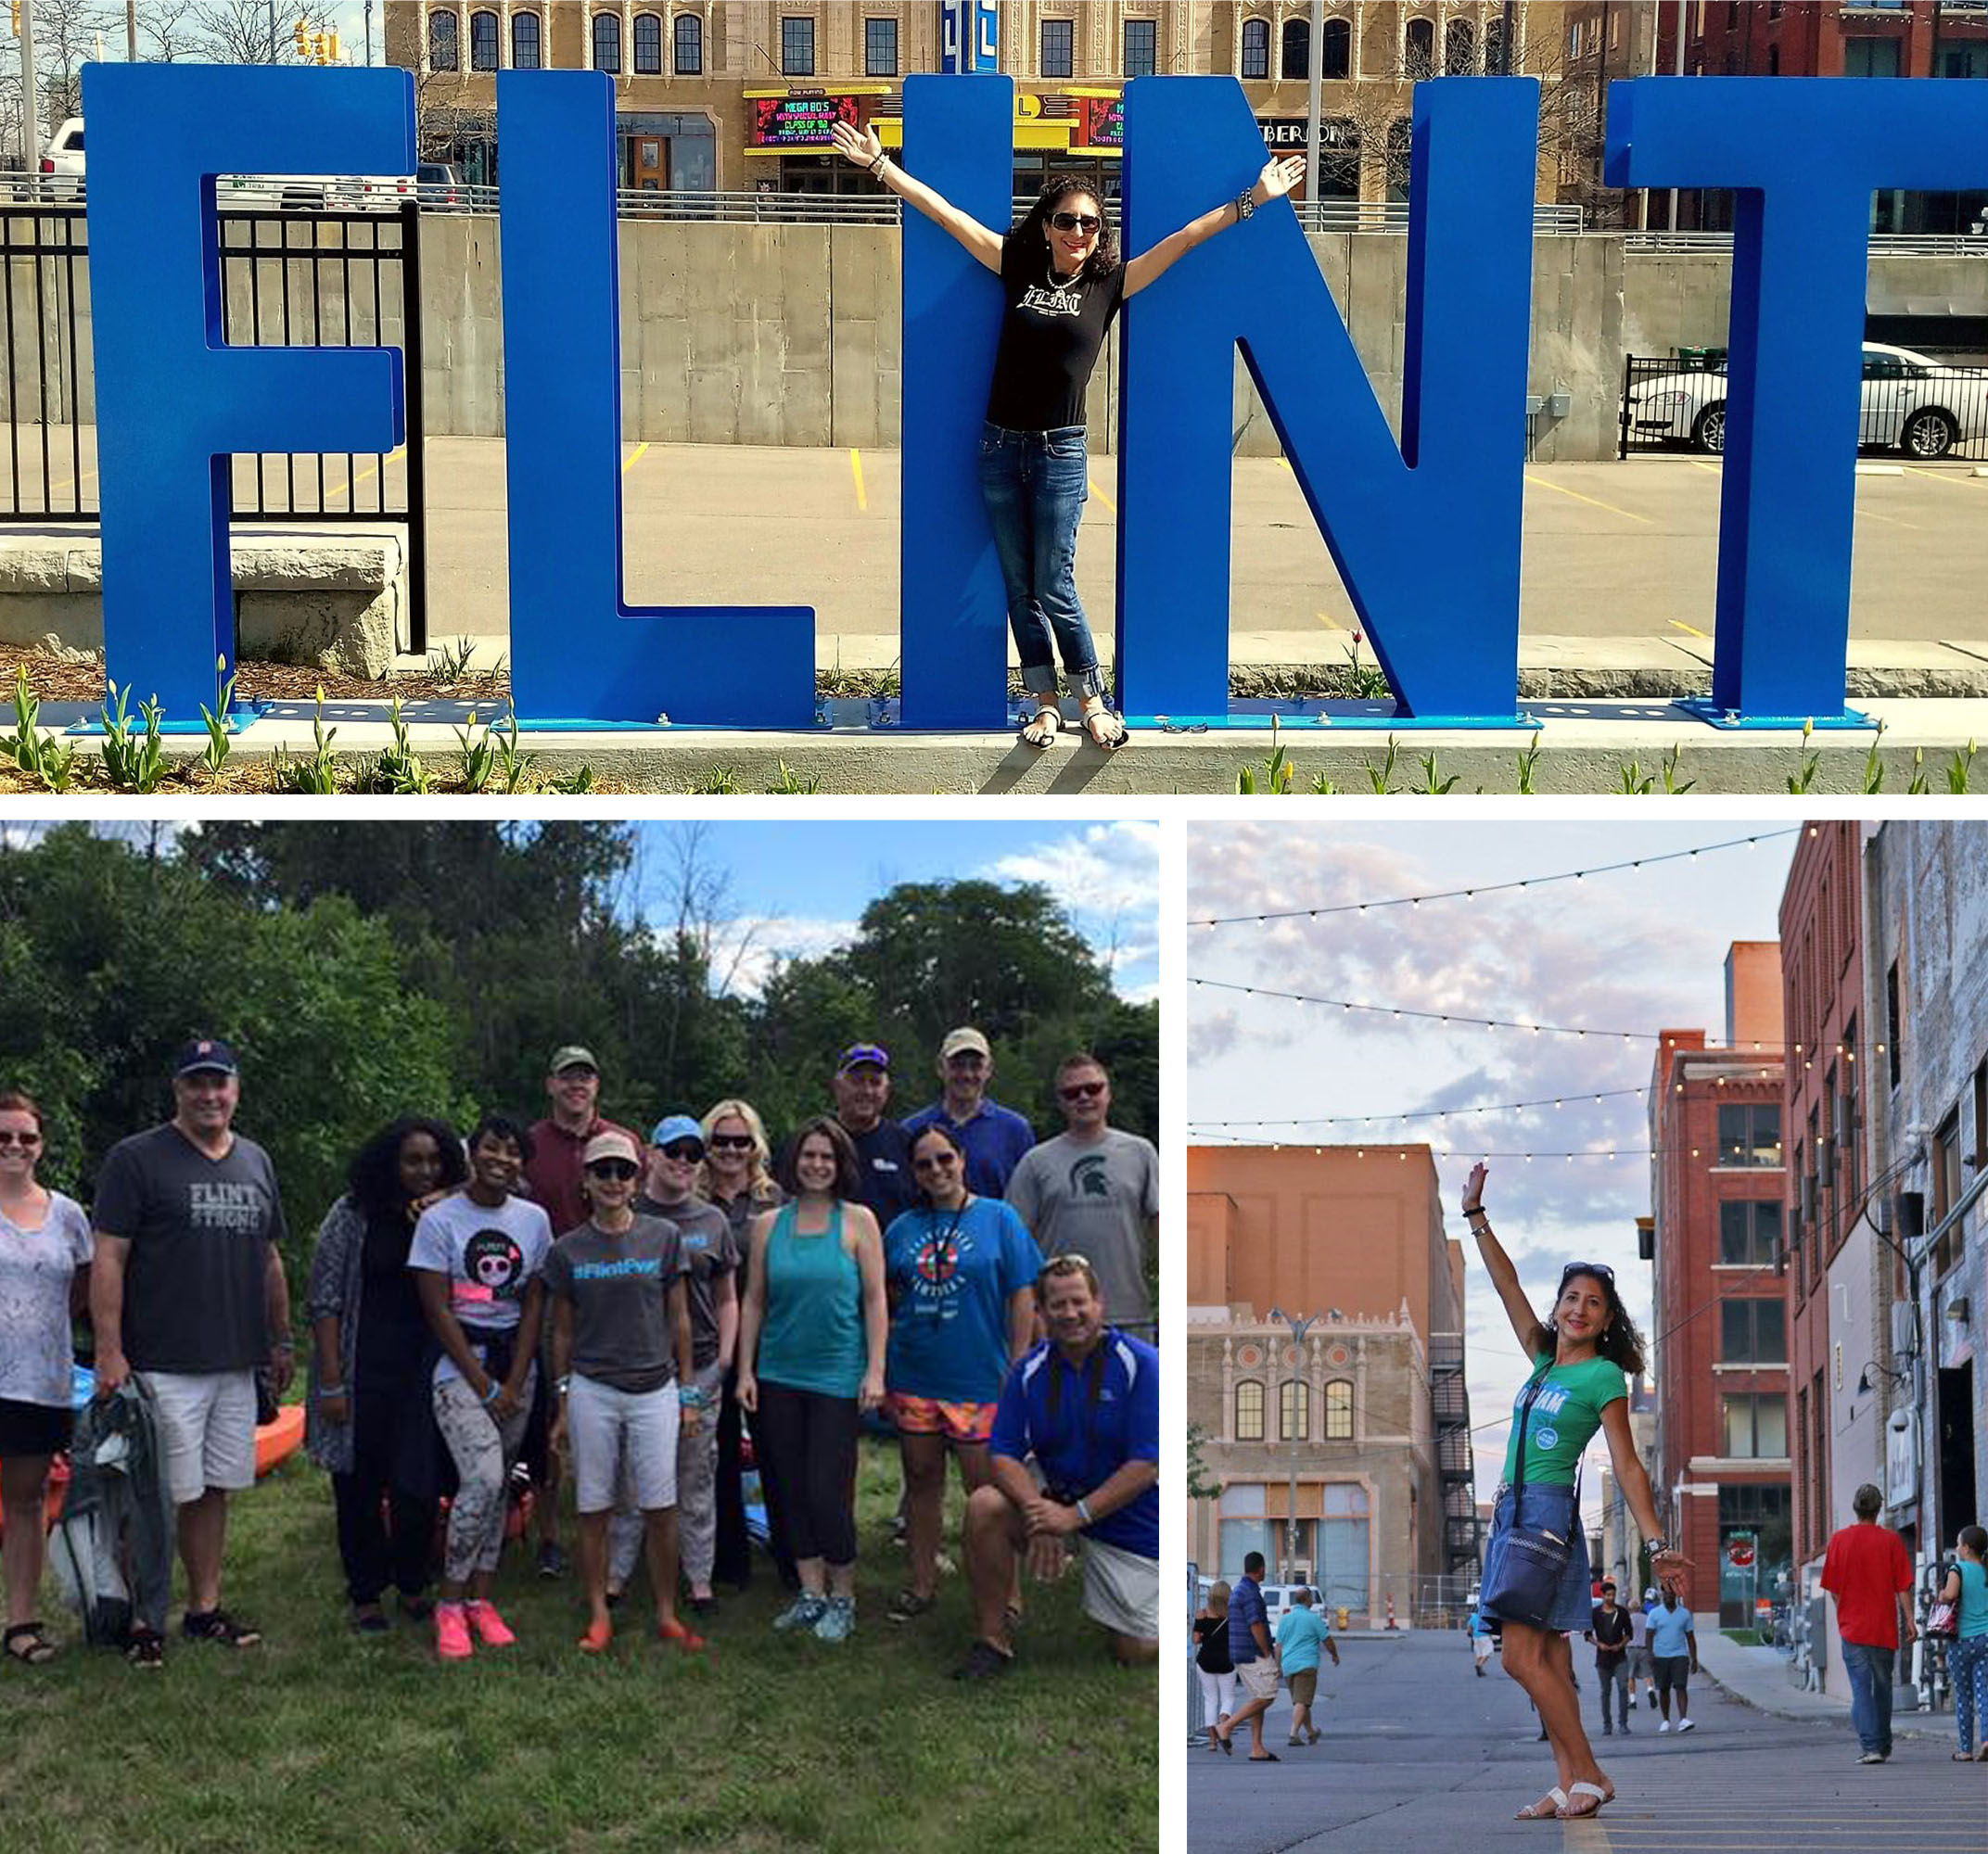 Kitty Gazall shows off the City of Flint